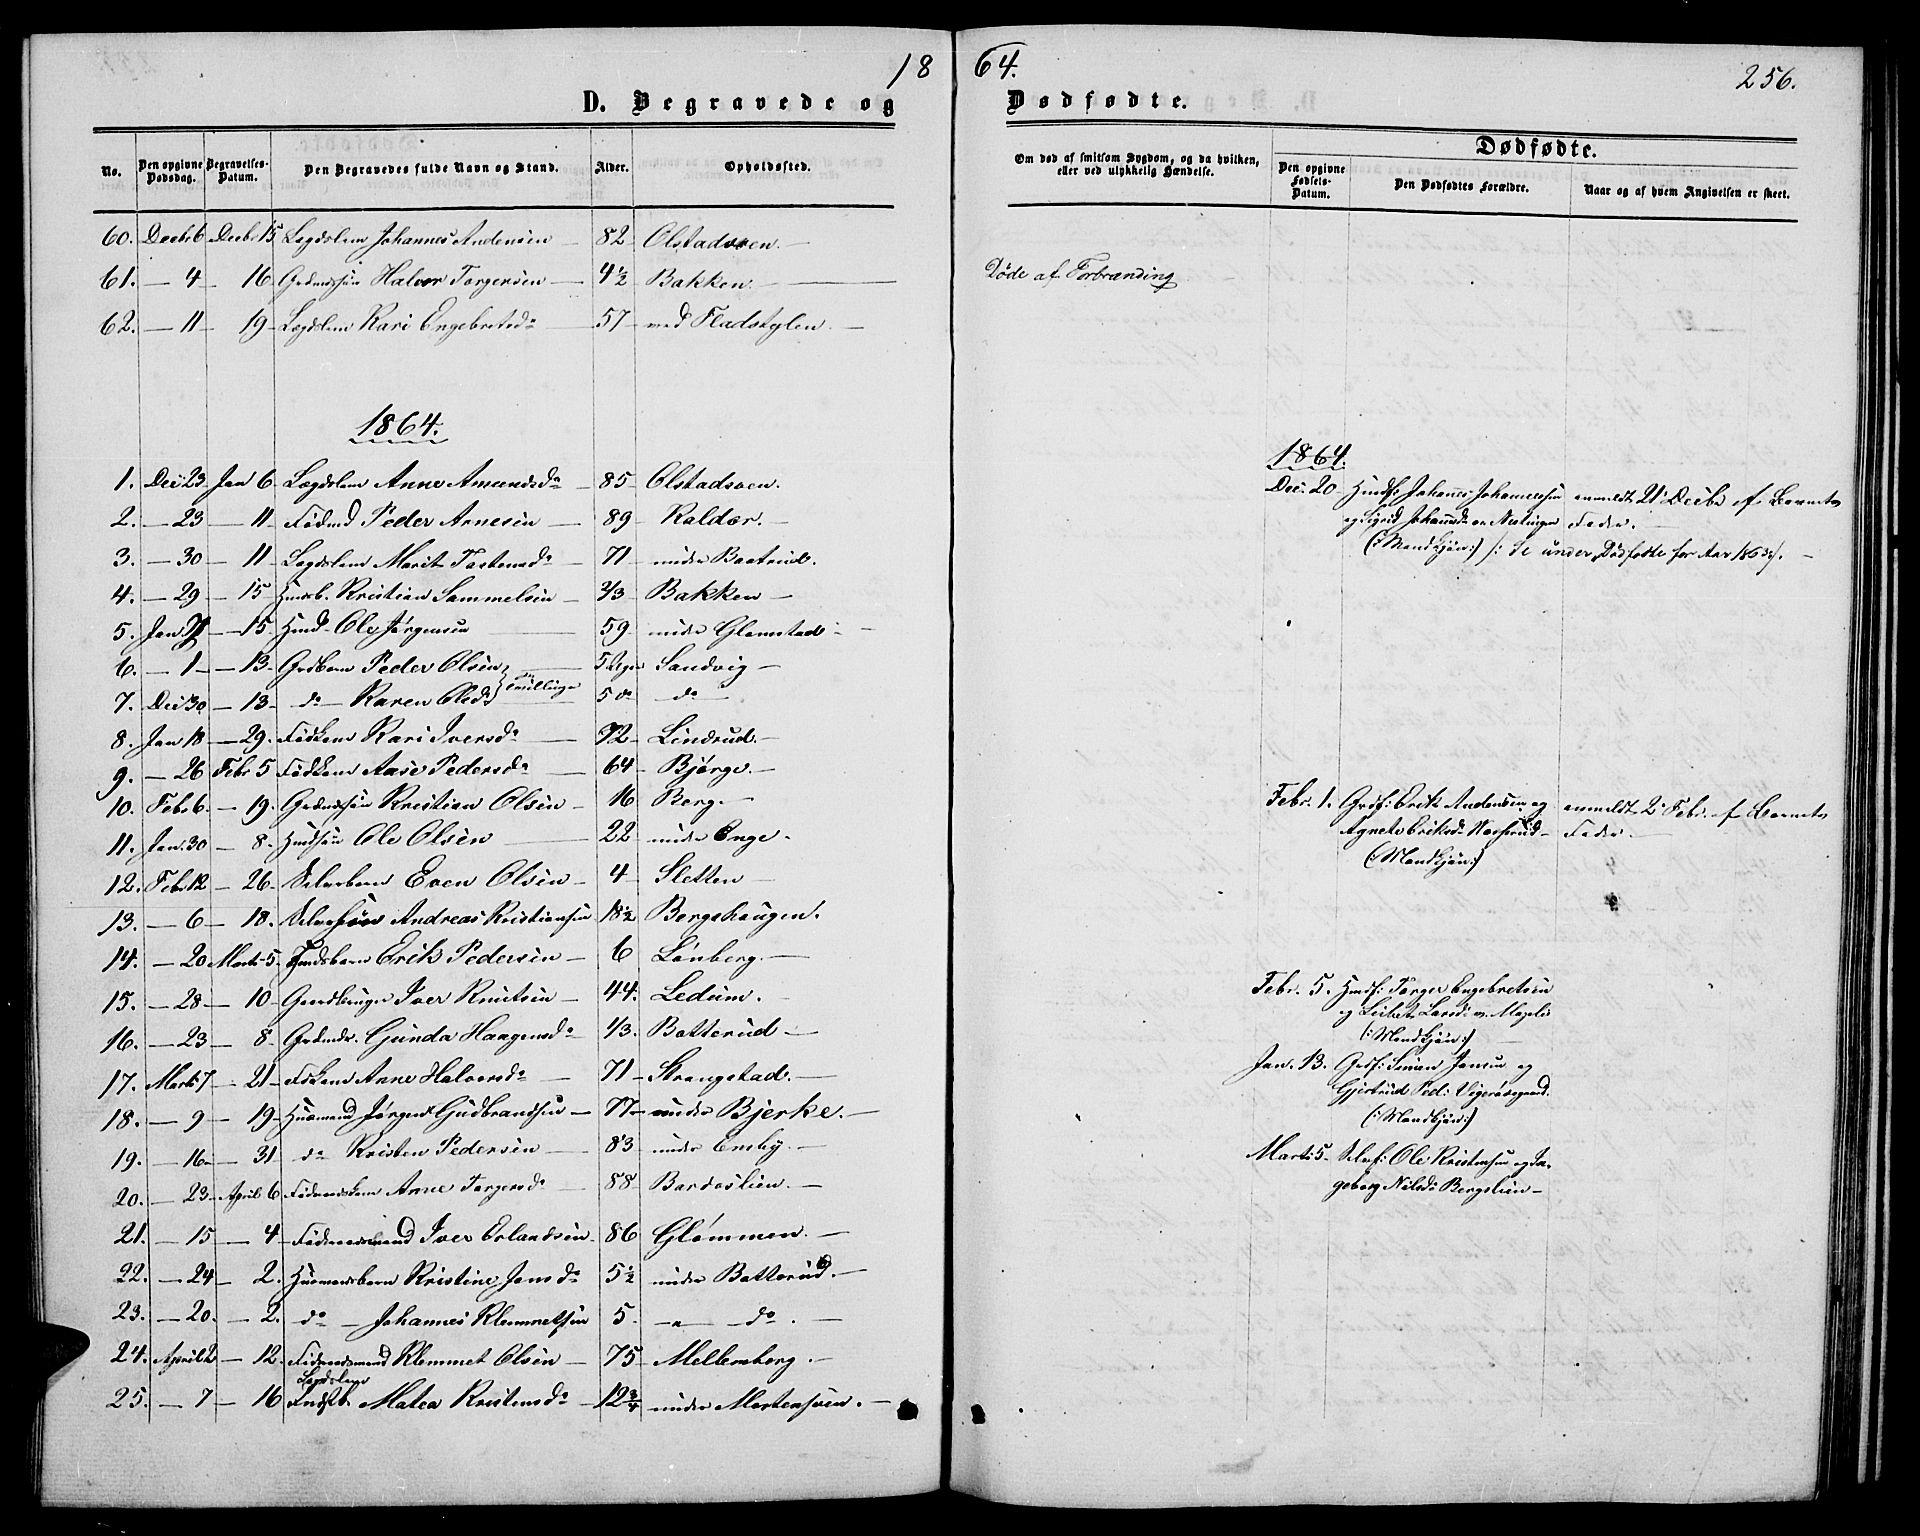 SAH, Øyer prestekontor, Klokkerbok nr. 1, 1863-1877, s. 256